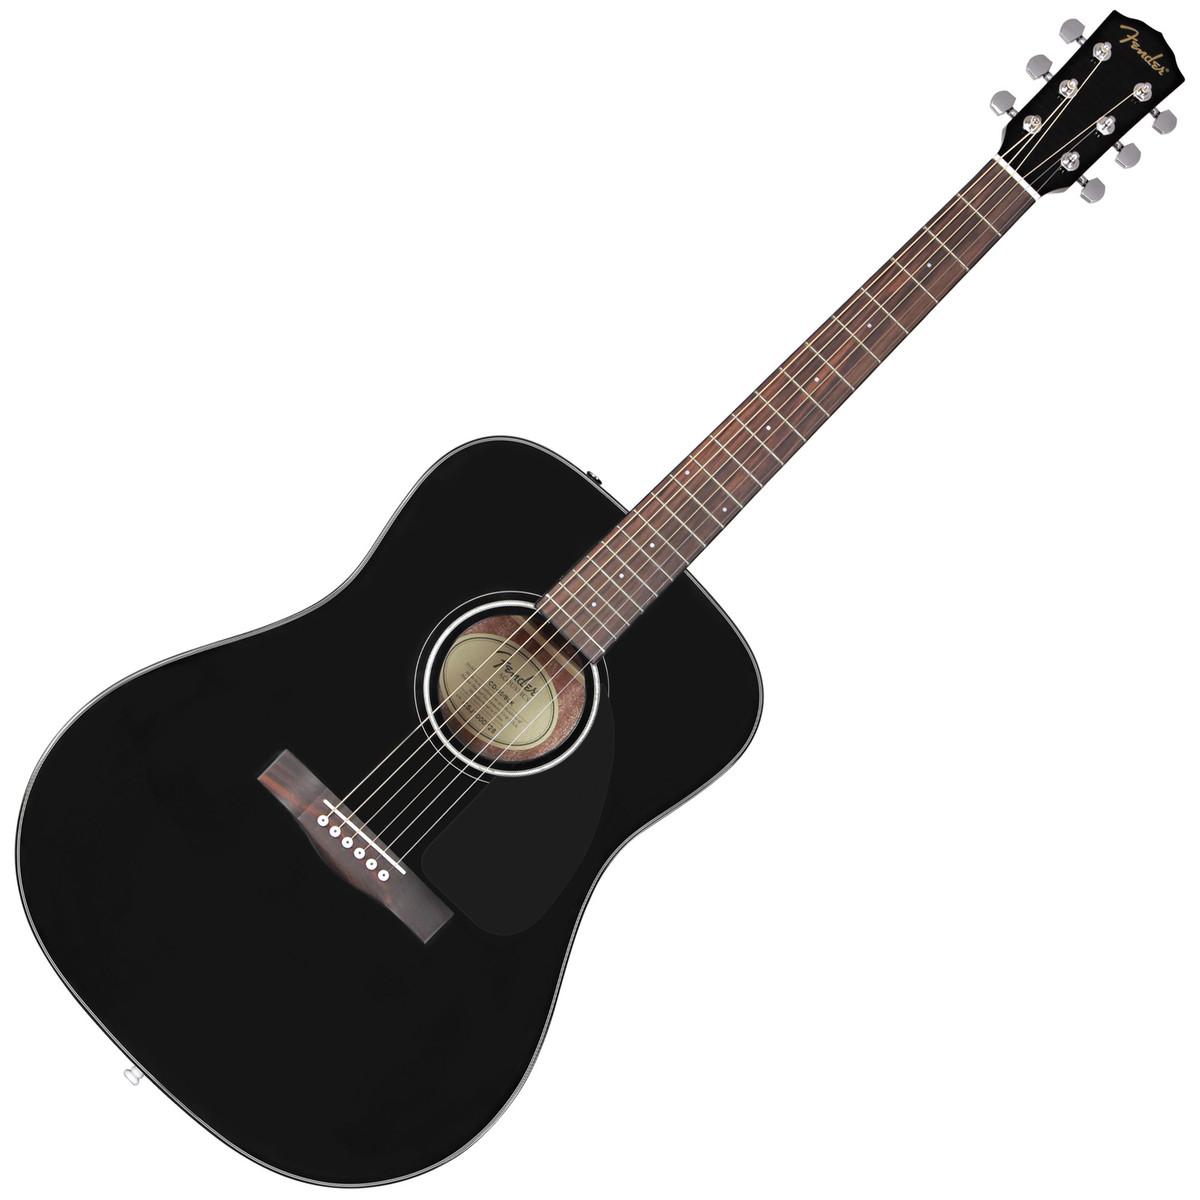 Disc Fender Cd 60 Acoustic Guitar Black Op Gear4music Com